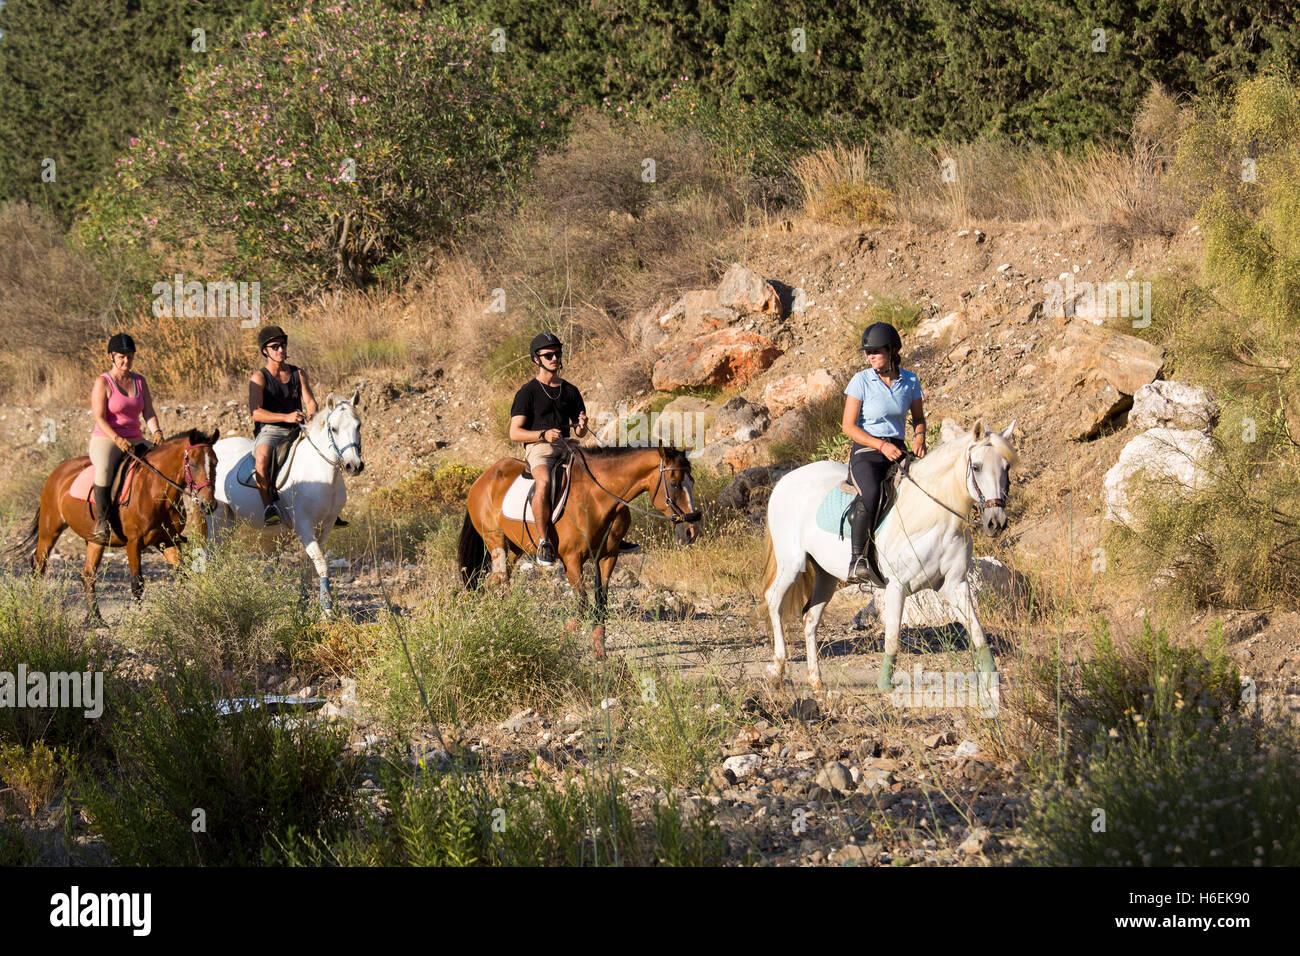 Montando a caballo a través de la naturaleza. Mijas. Costa del Sol, provincia de Málaga. Andalucía Imagen De Stock